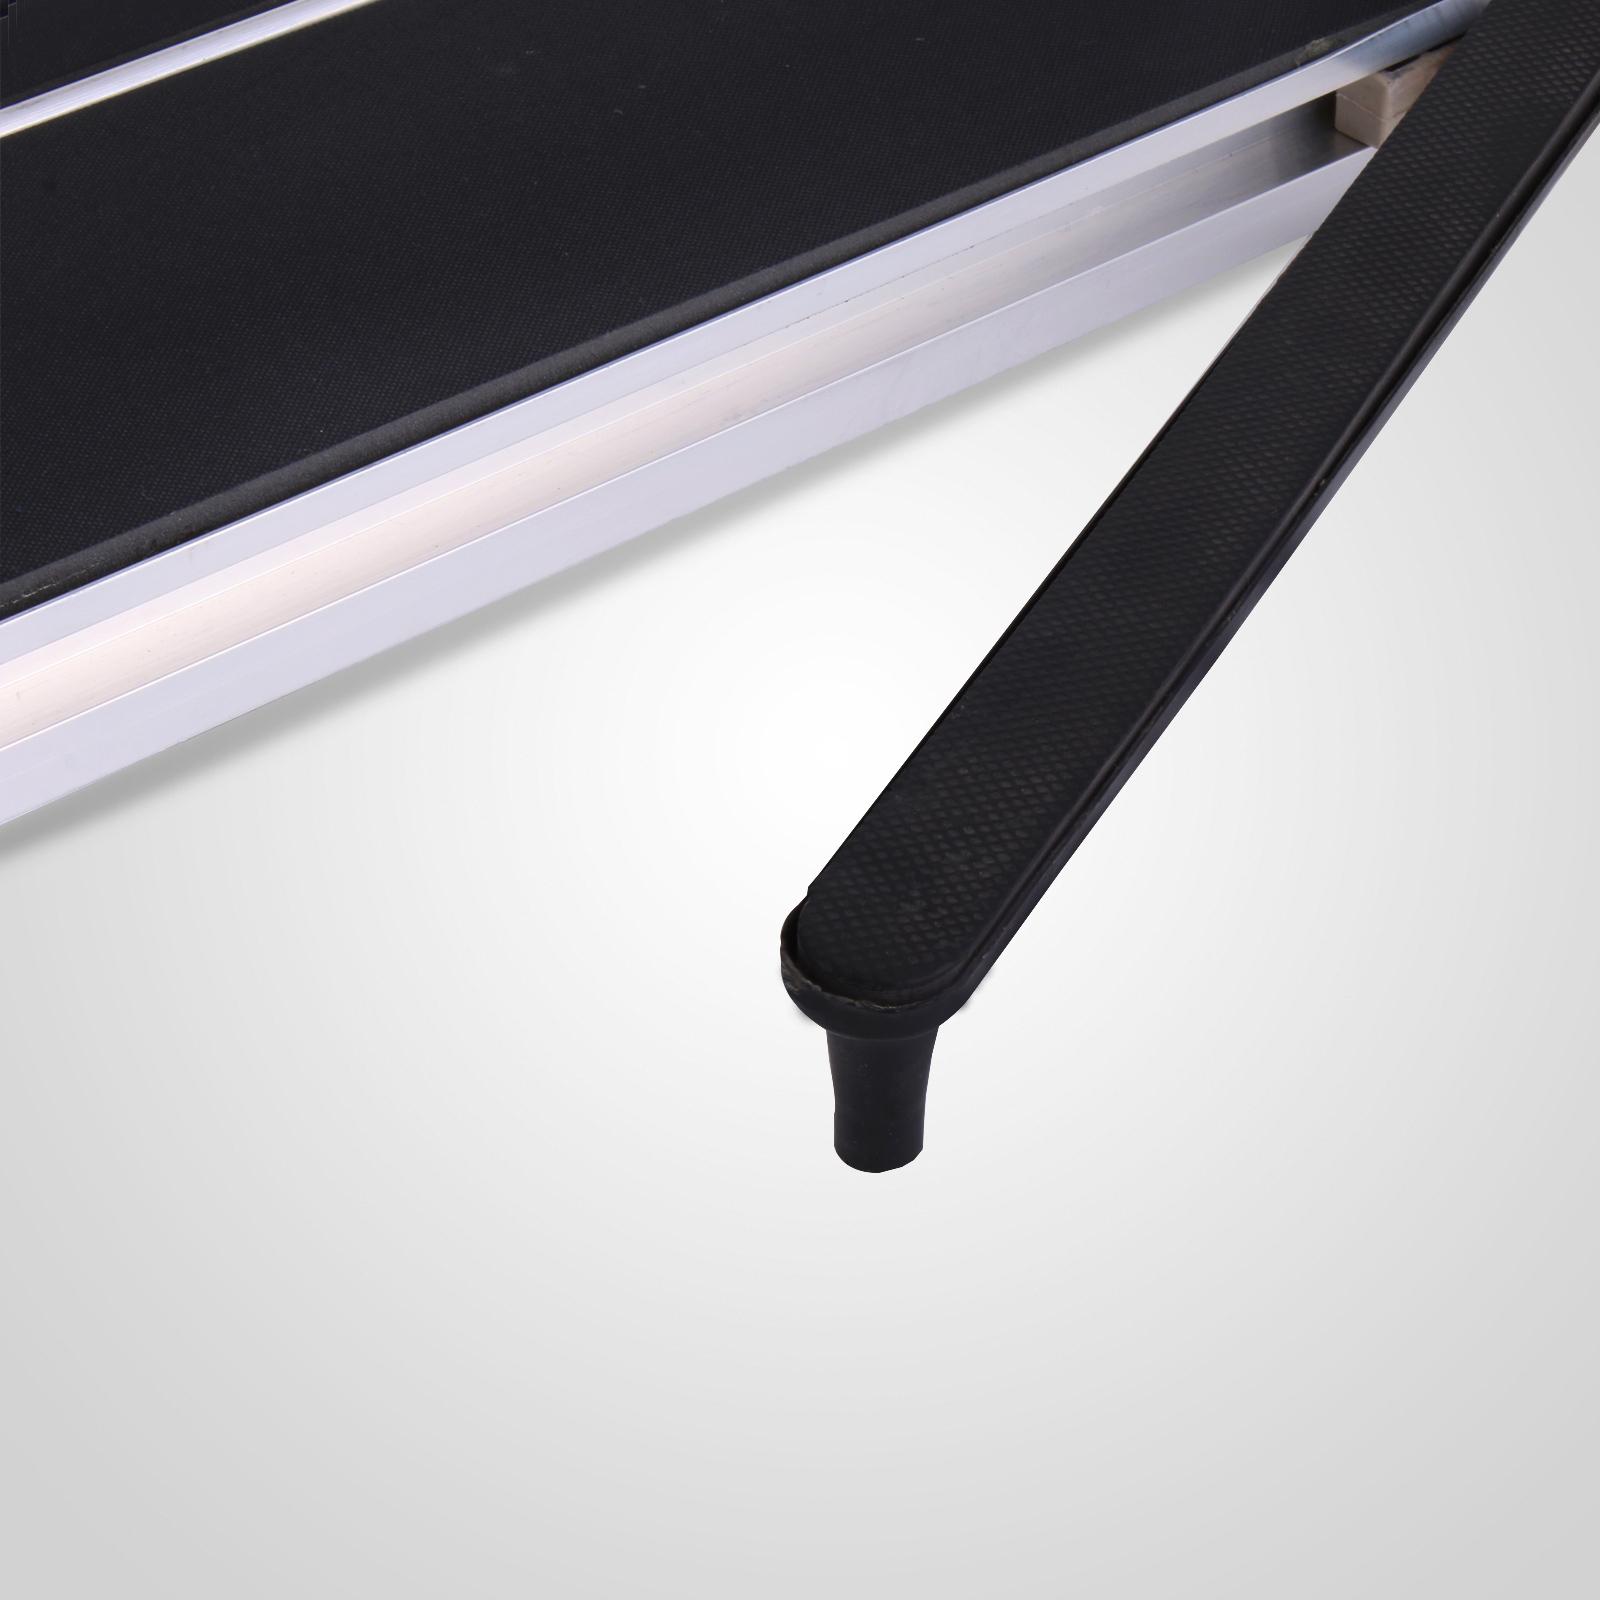 Tile-Cutter-40-034-48-039-039-Manual-Cutting-Machine-0-24-0-6-Thickness-Porcelain-Ceramic thumbnail 19